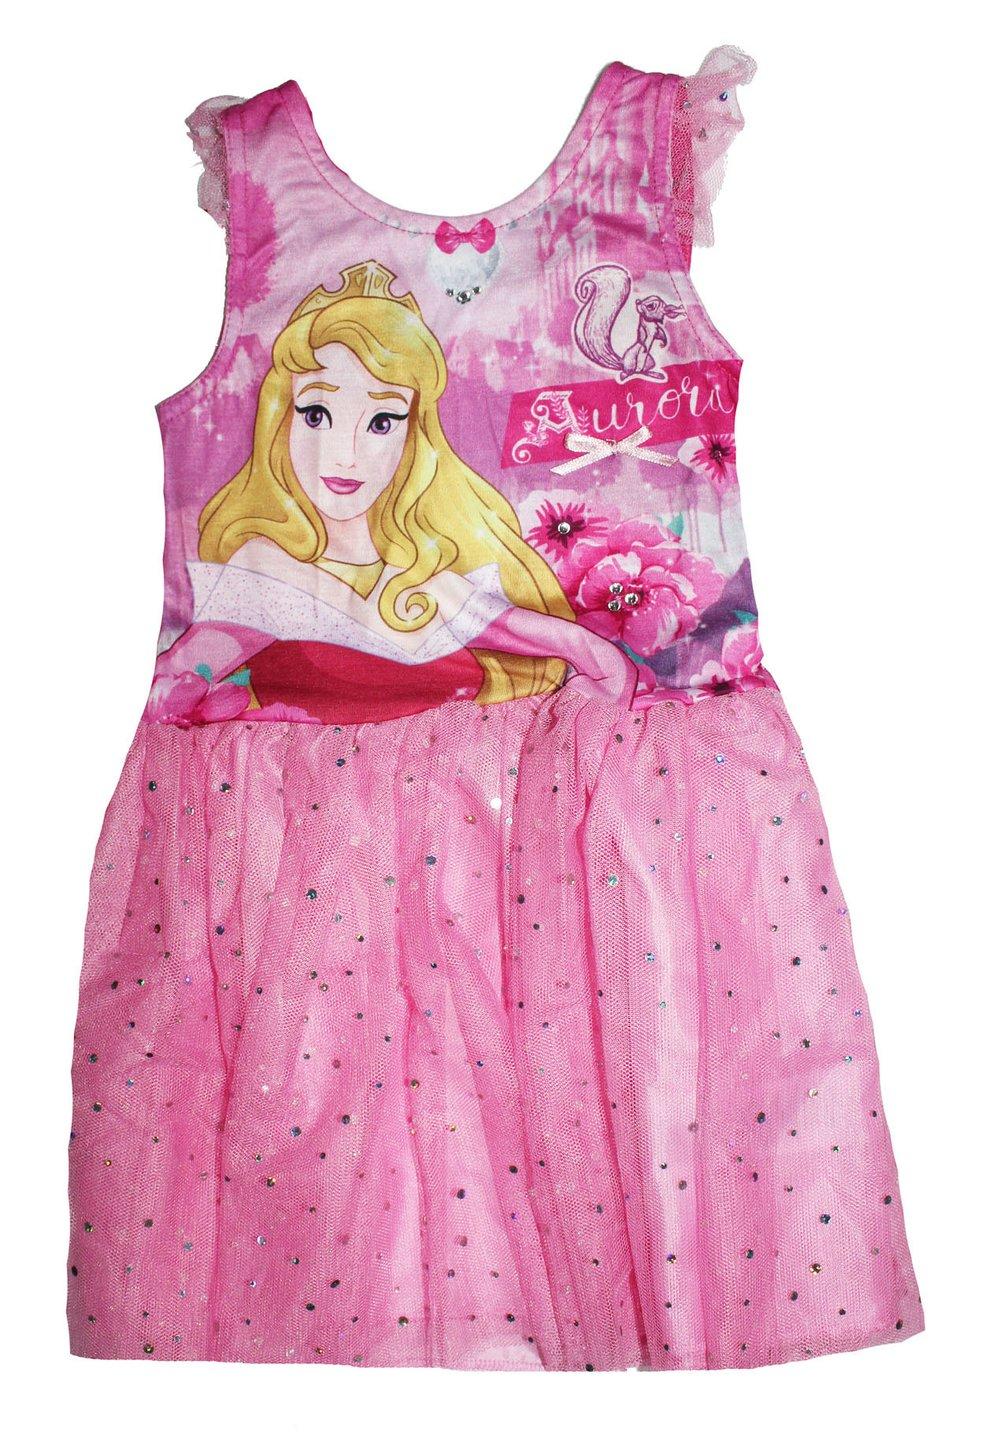 Rochie tutu, Aurora, roz imagine